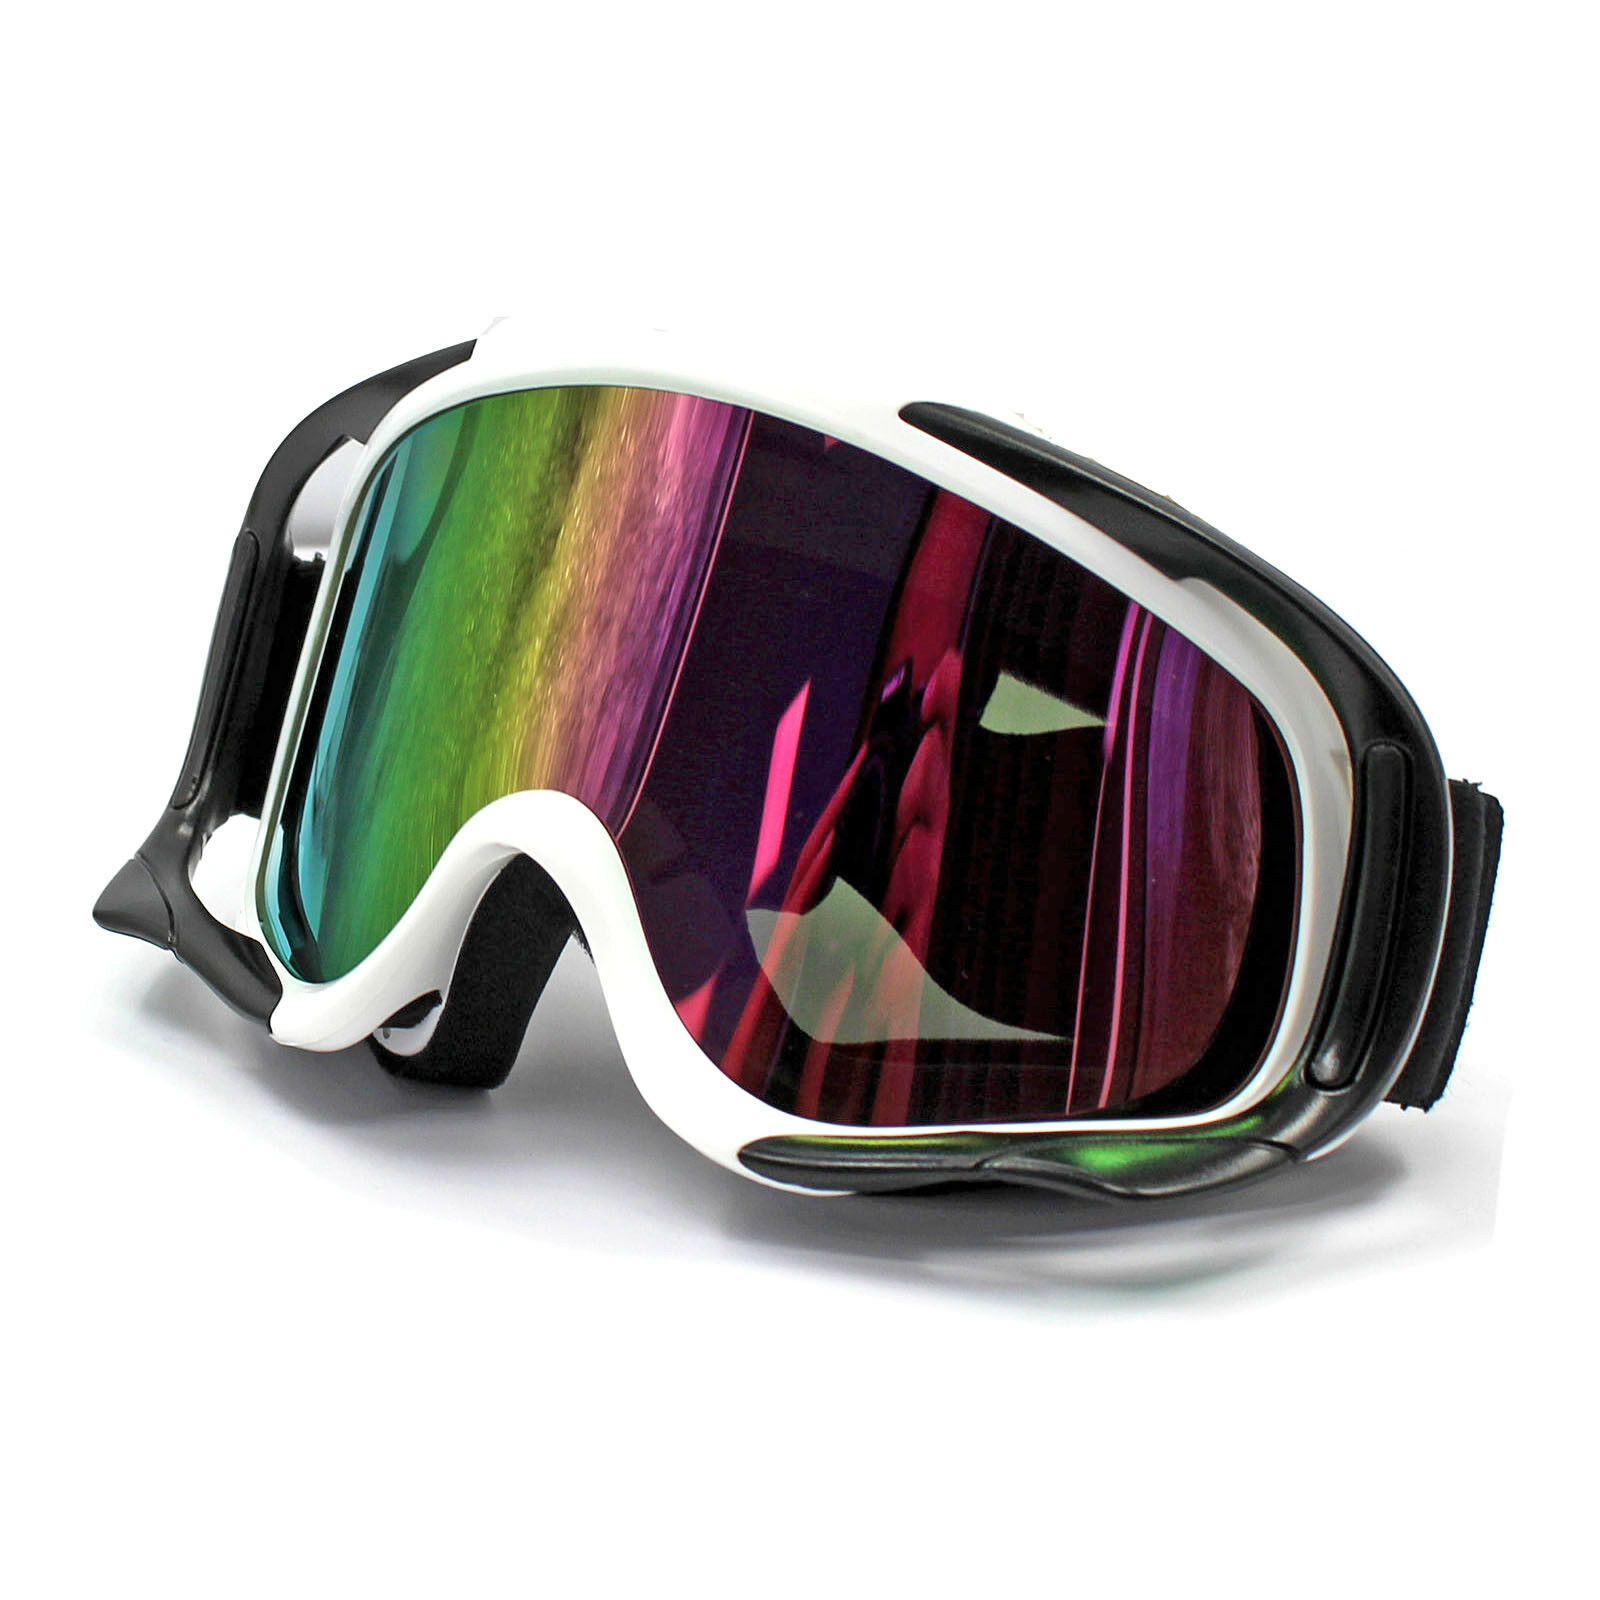 Snowboard Ski Snow Goggles Graffiti Anti-Fog UV Spherical Lens Adult Sport Glass